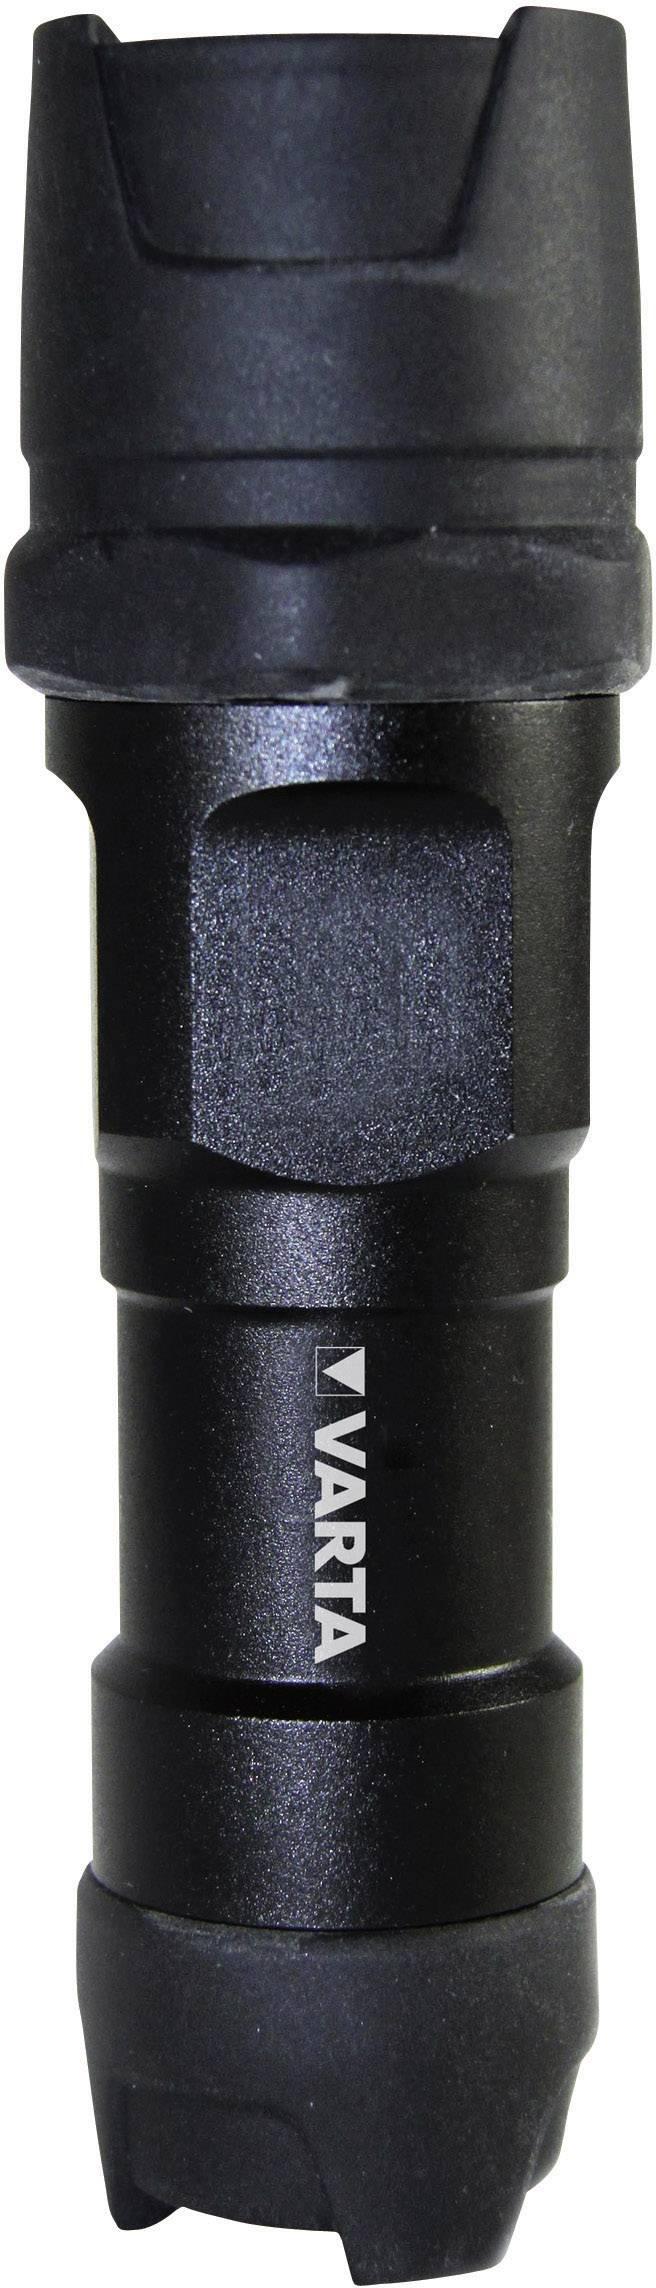 Vreckové LED svietidlo Varta, nerozbitné, 1 W, 3 micro